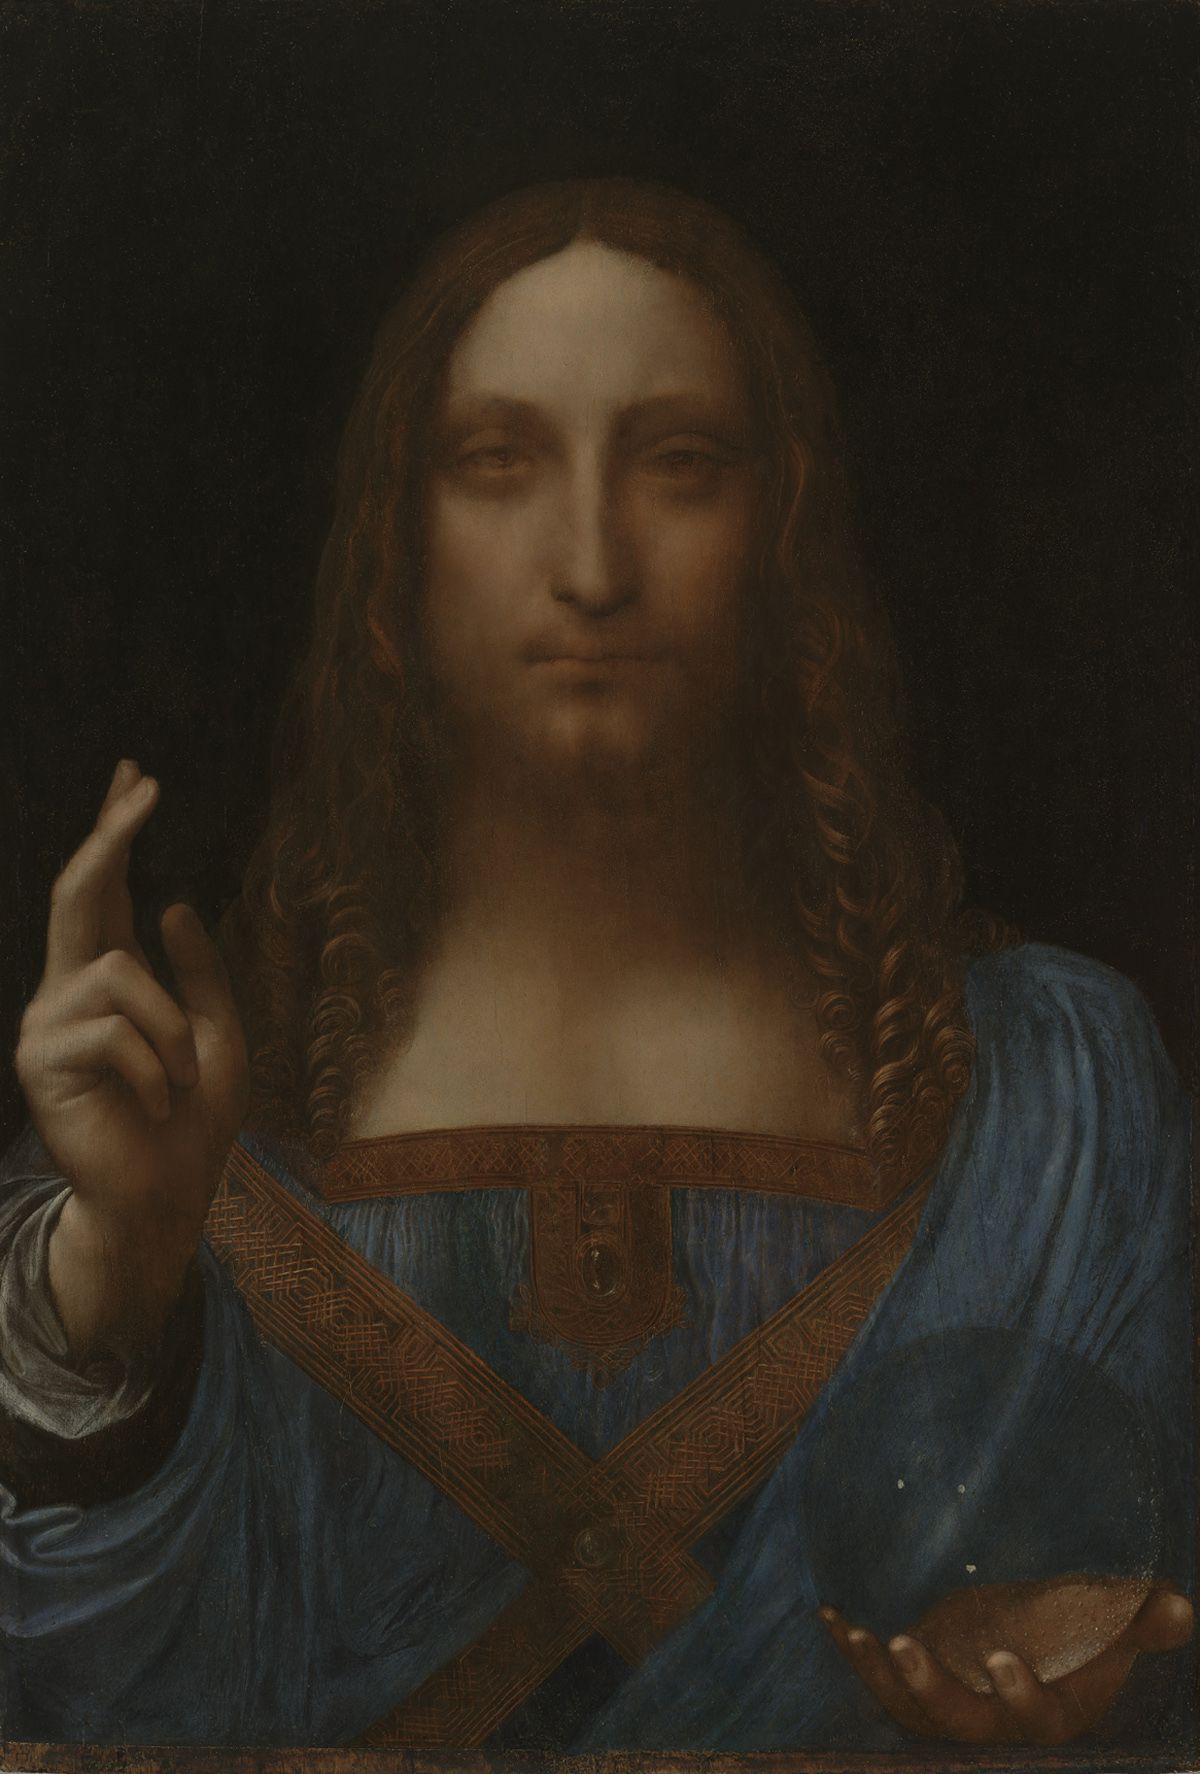 Leonardo da Vinci Paintings and Artwork About